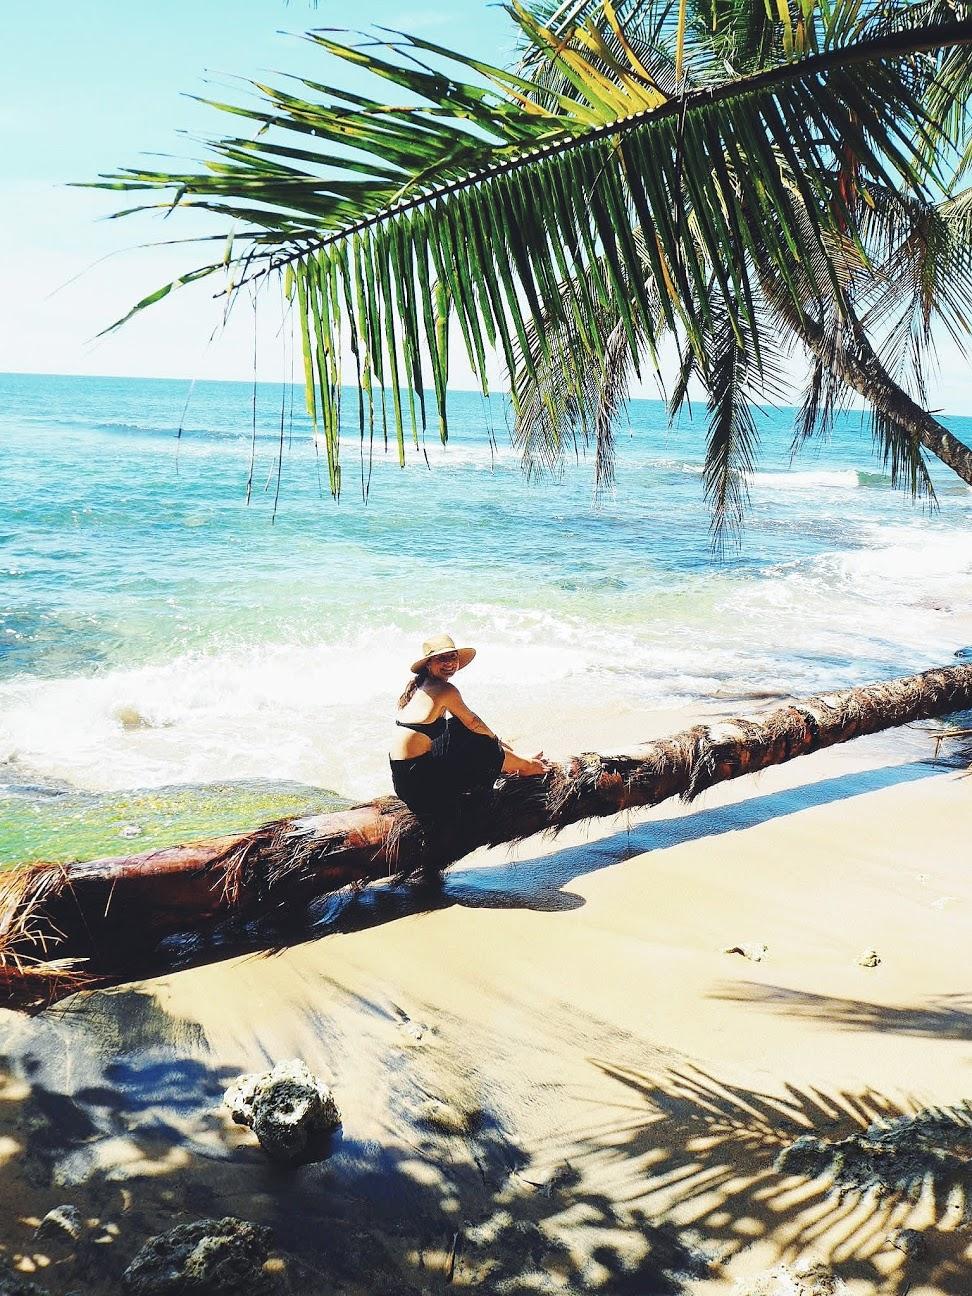 Costa rice 10 ting du skal vide guide